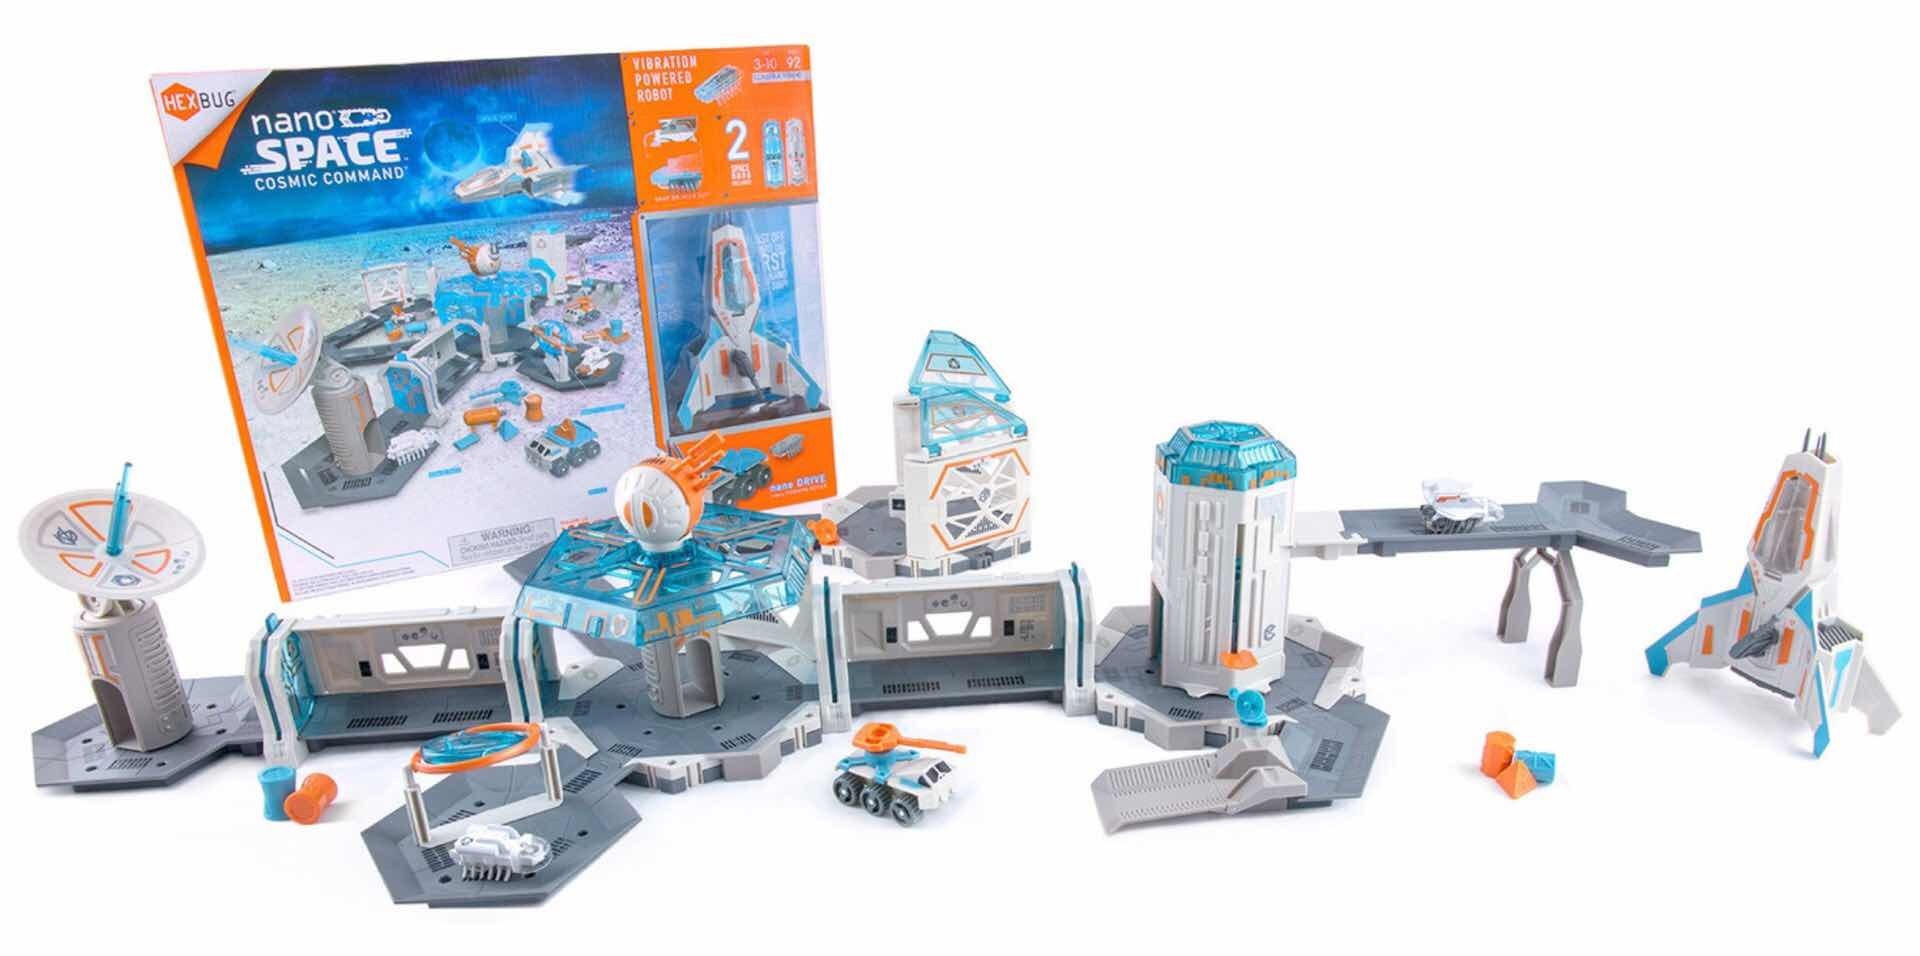 HEXBUG nano Space Cosmic Command set. ($40)